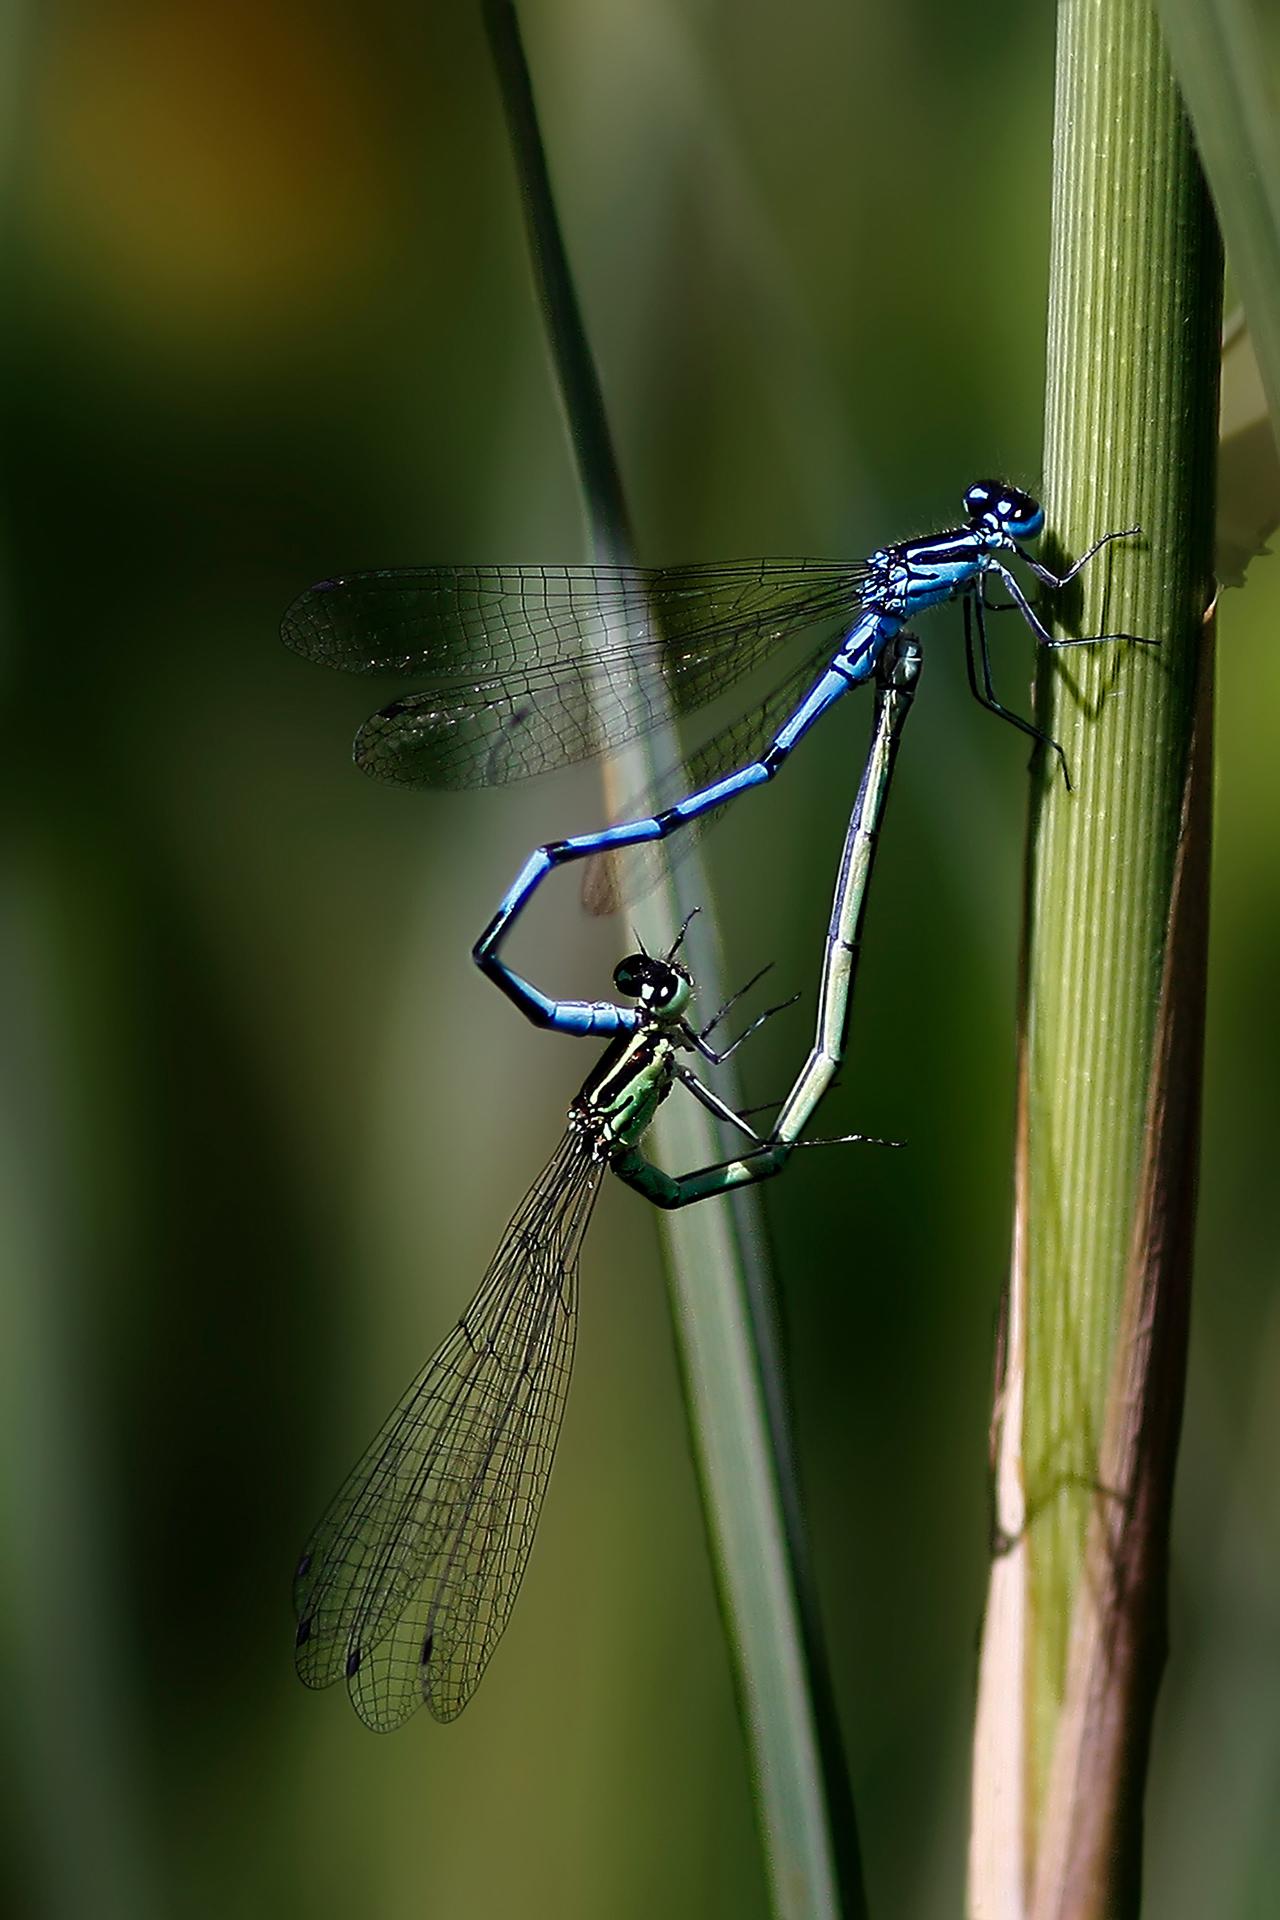 Dragonflies in love (Bente R. Dybesland, Team Raw)